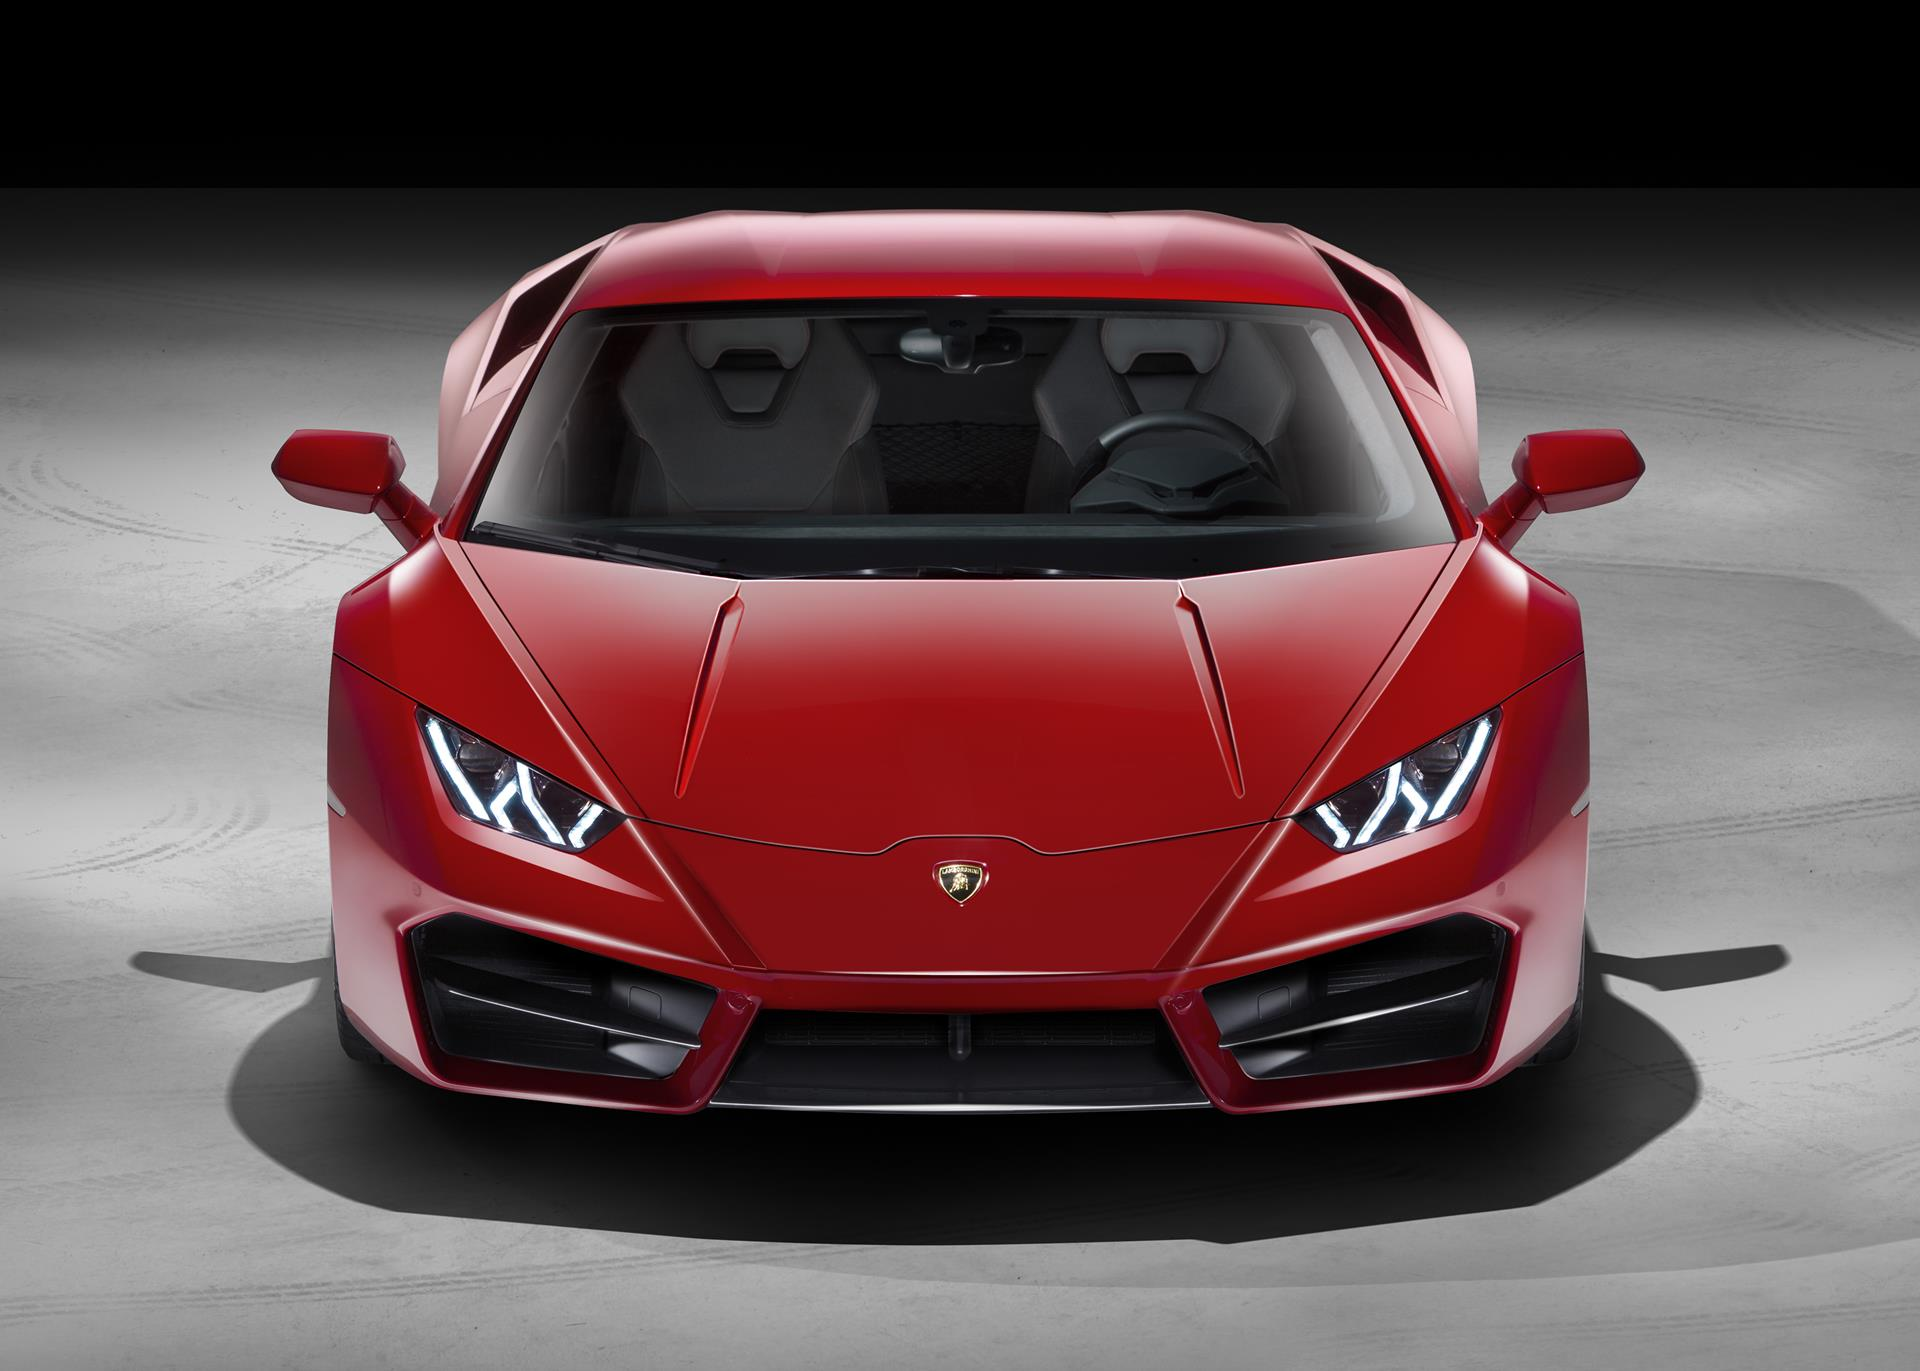 2016 Lamborghini Huracán Lp 580 2 News And Information